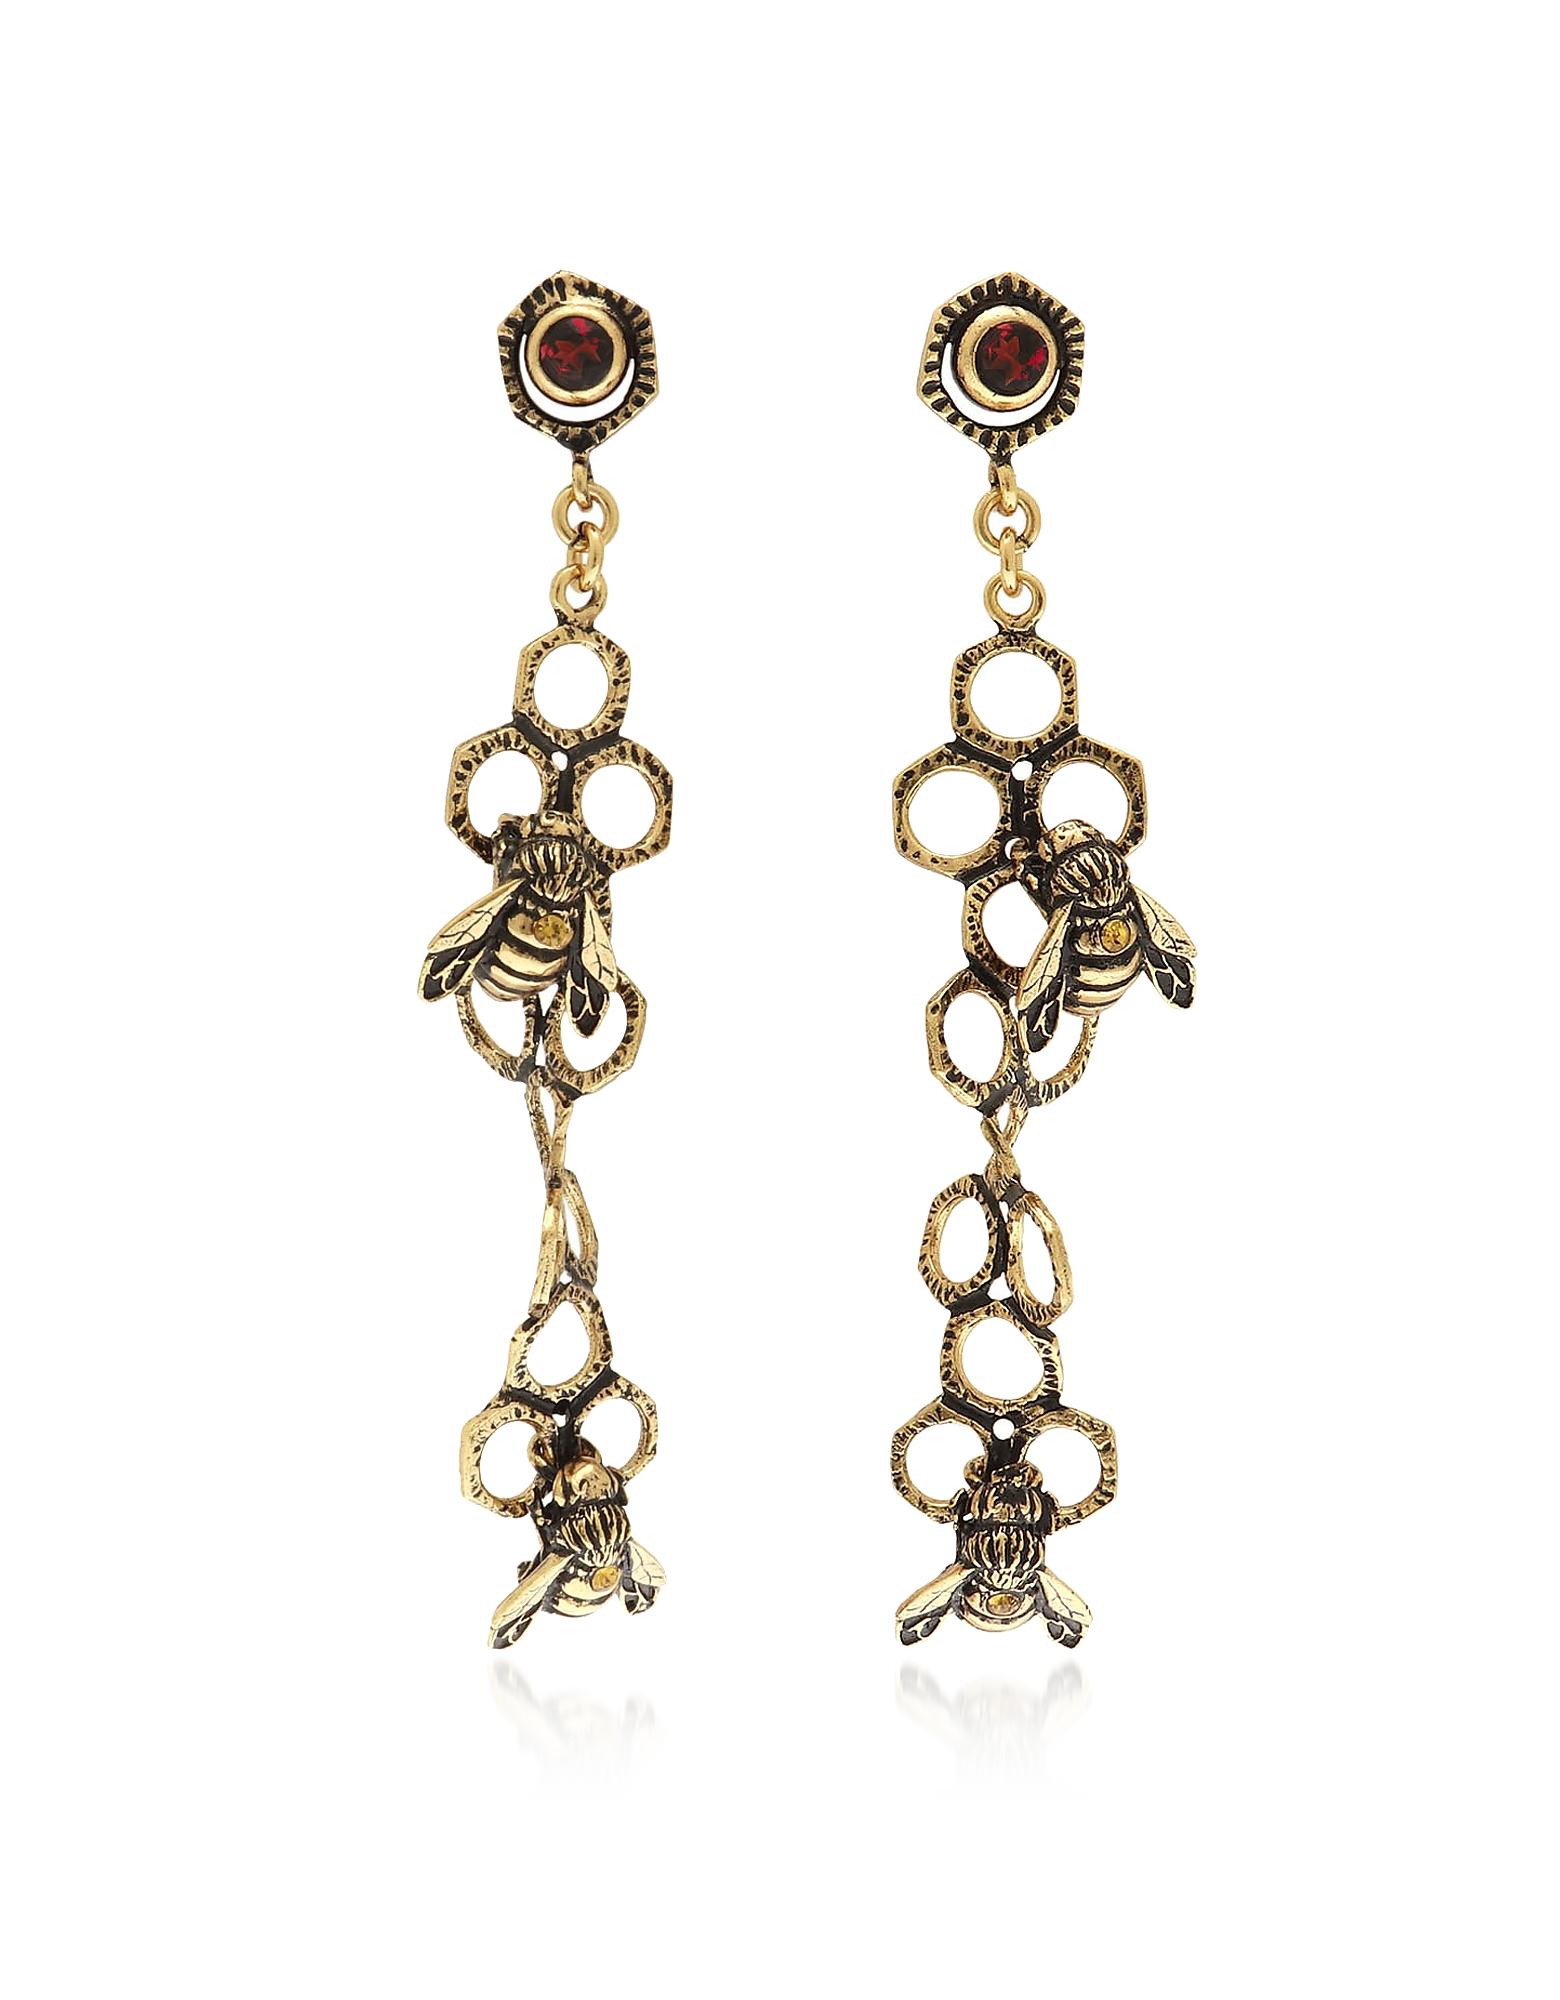 Forzieri coupon: Alcozer & J  Earrings Golden Brass Pollen Drop Earrings